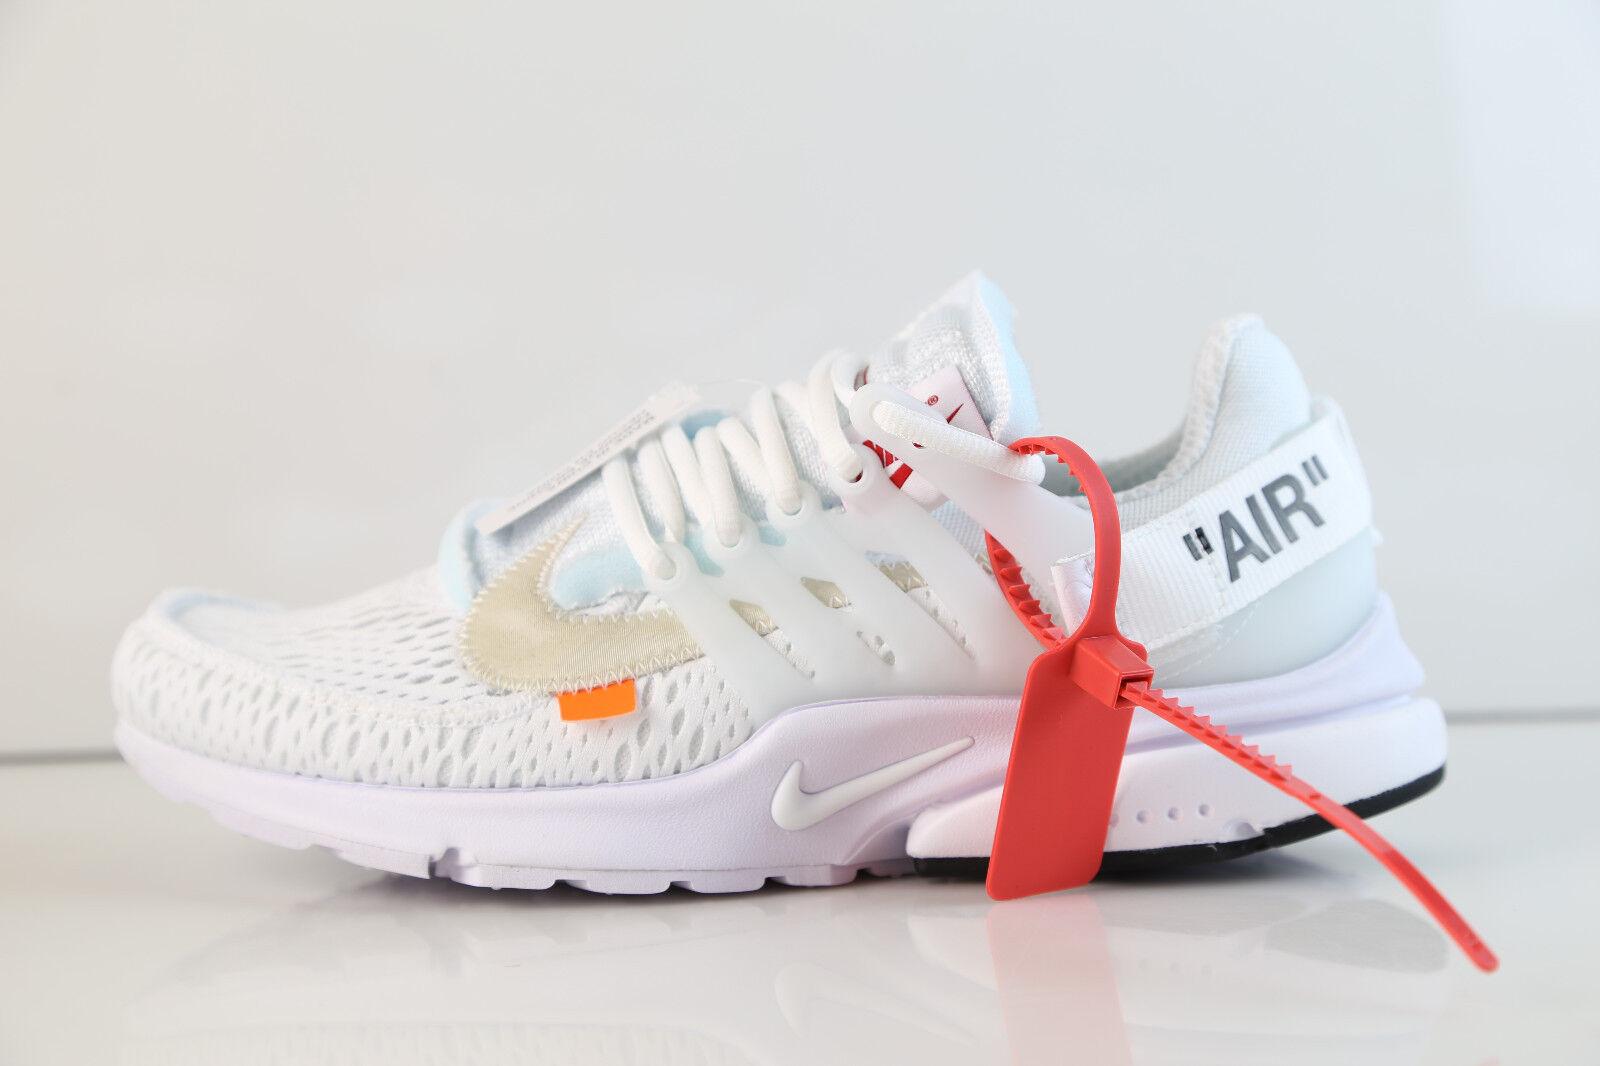 Nike air presto biancastro virgil abloh bianco 2 aa3830-100 2018 4-13 10 10